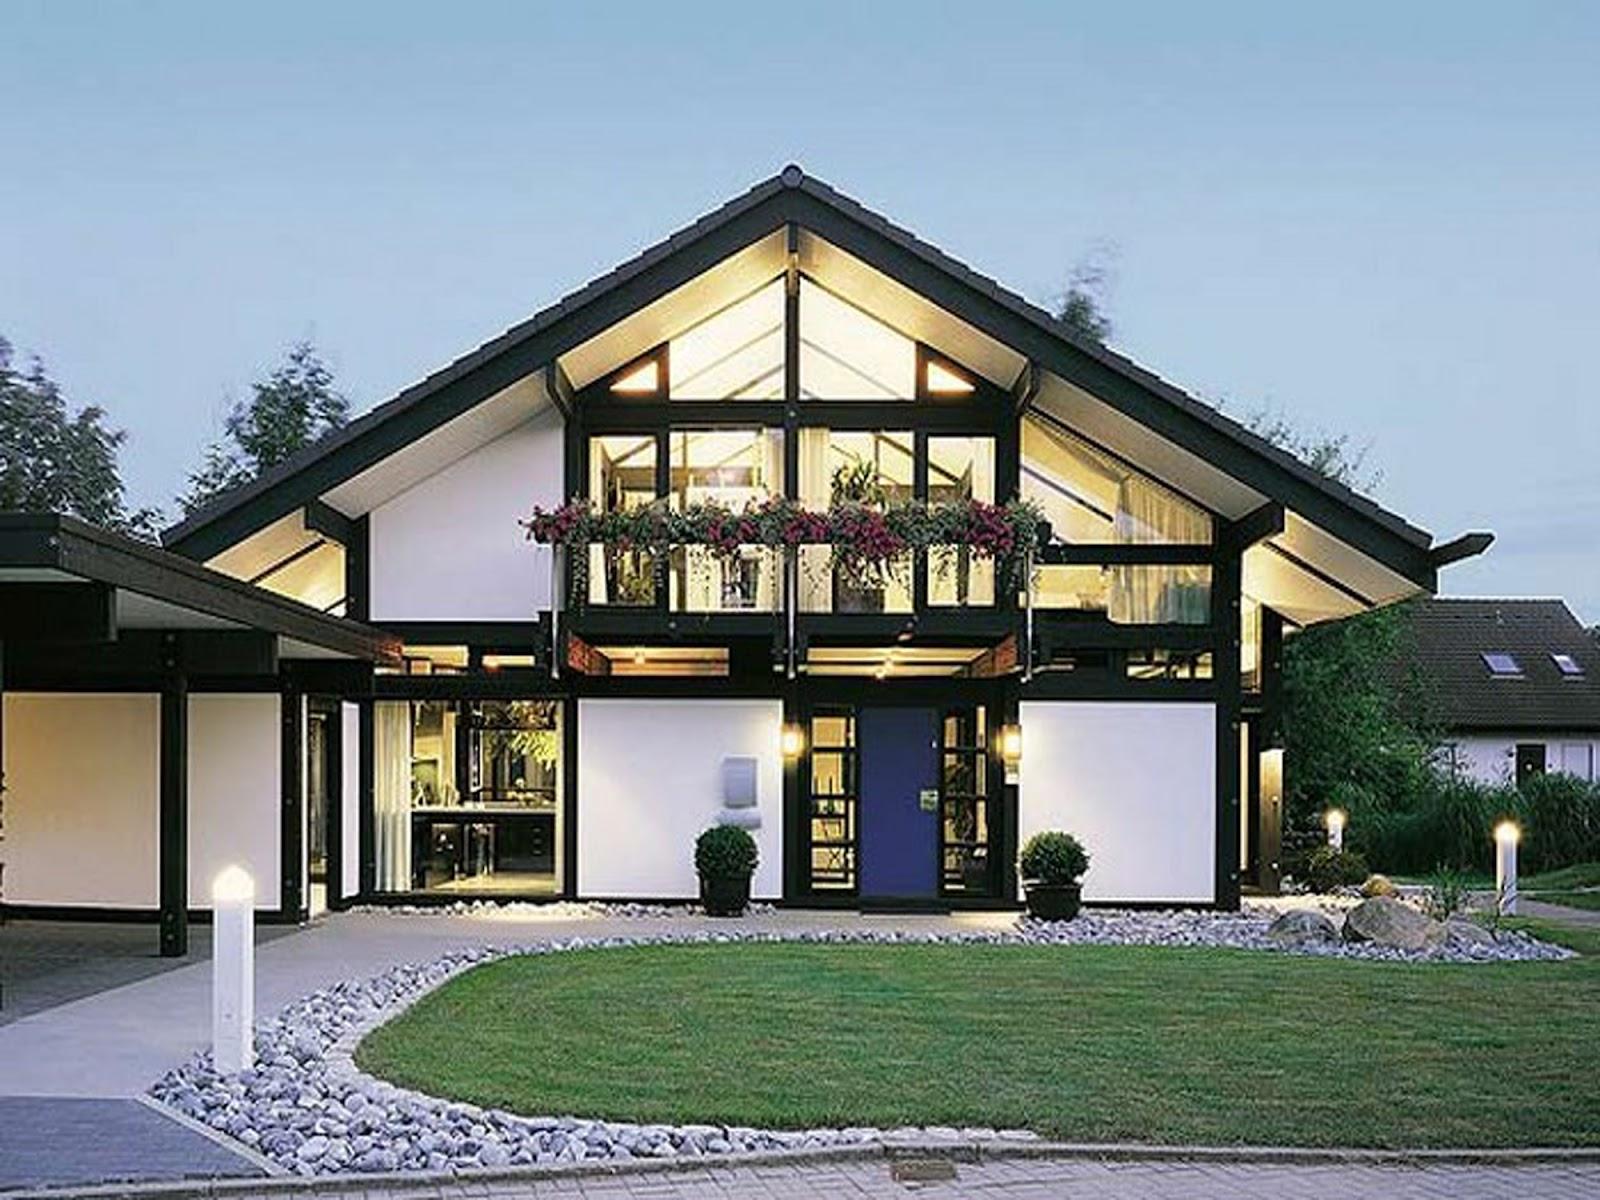 New home designs latest.: Beautiful latest modern home ... on Beautiful Home Decor  id=33515